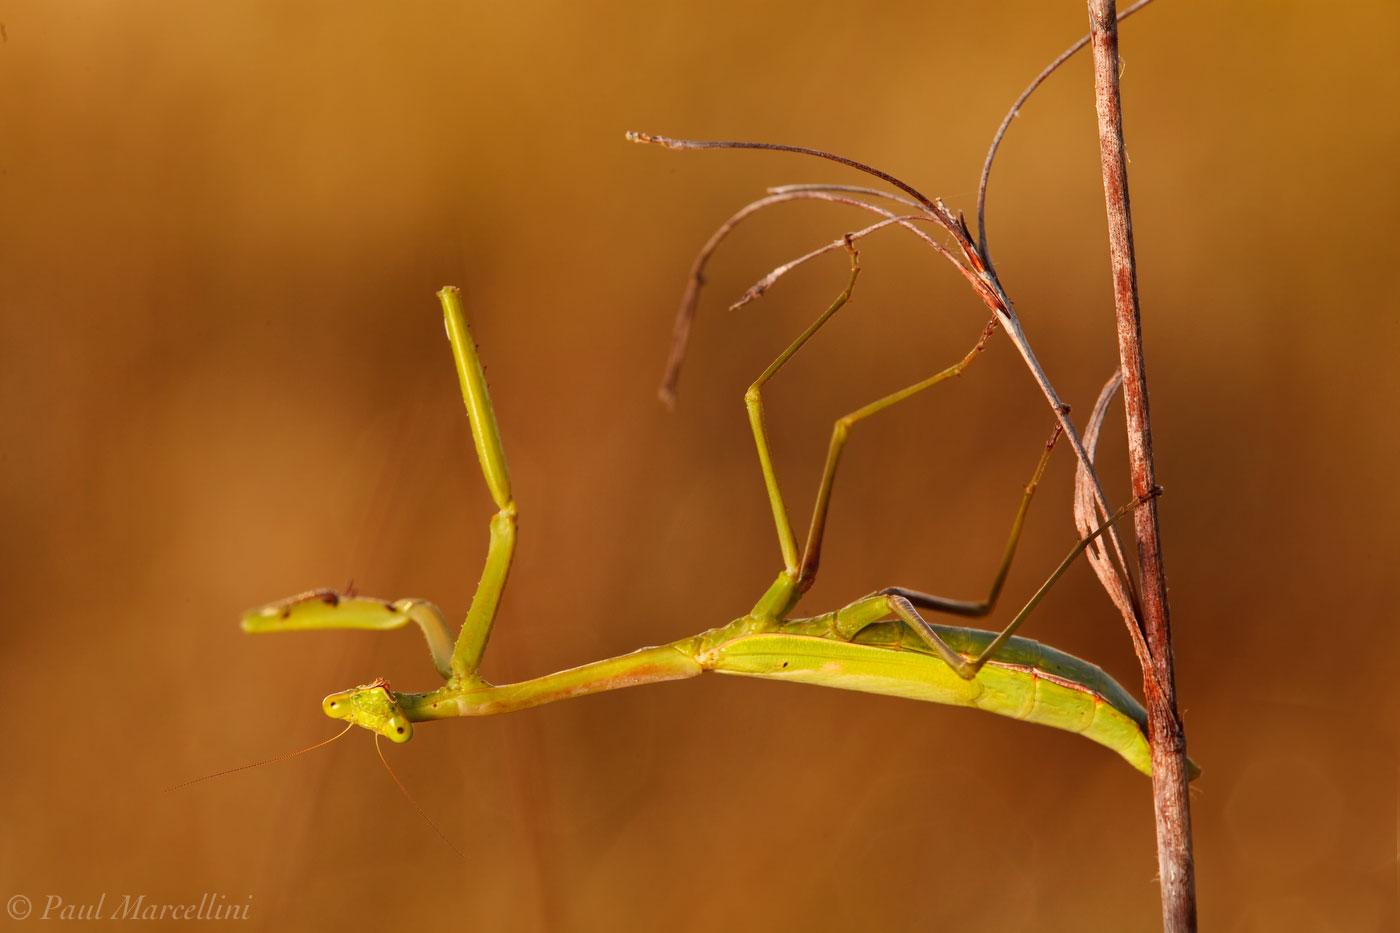 preying mantis, everglades national park, photo